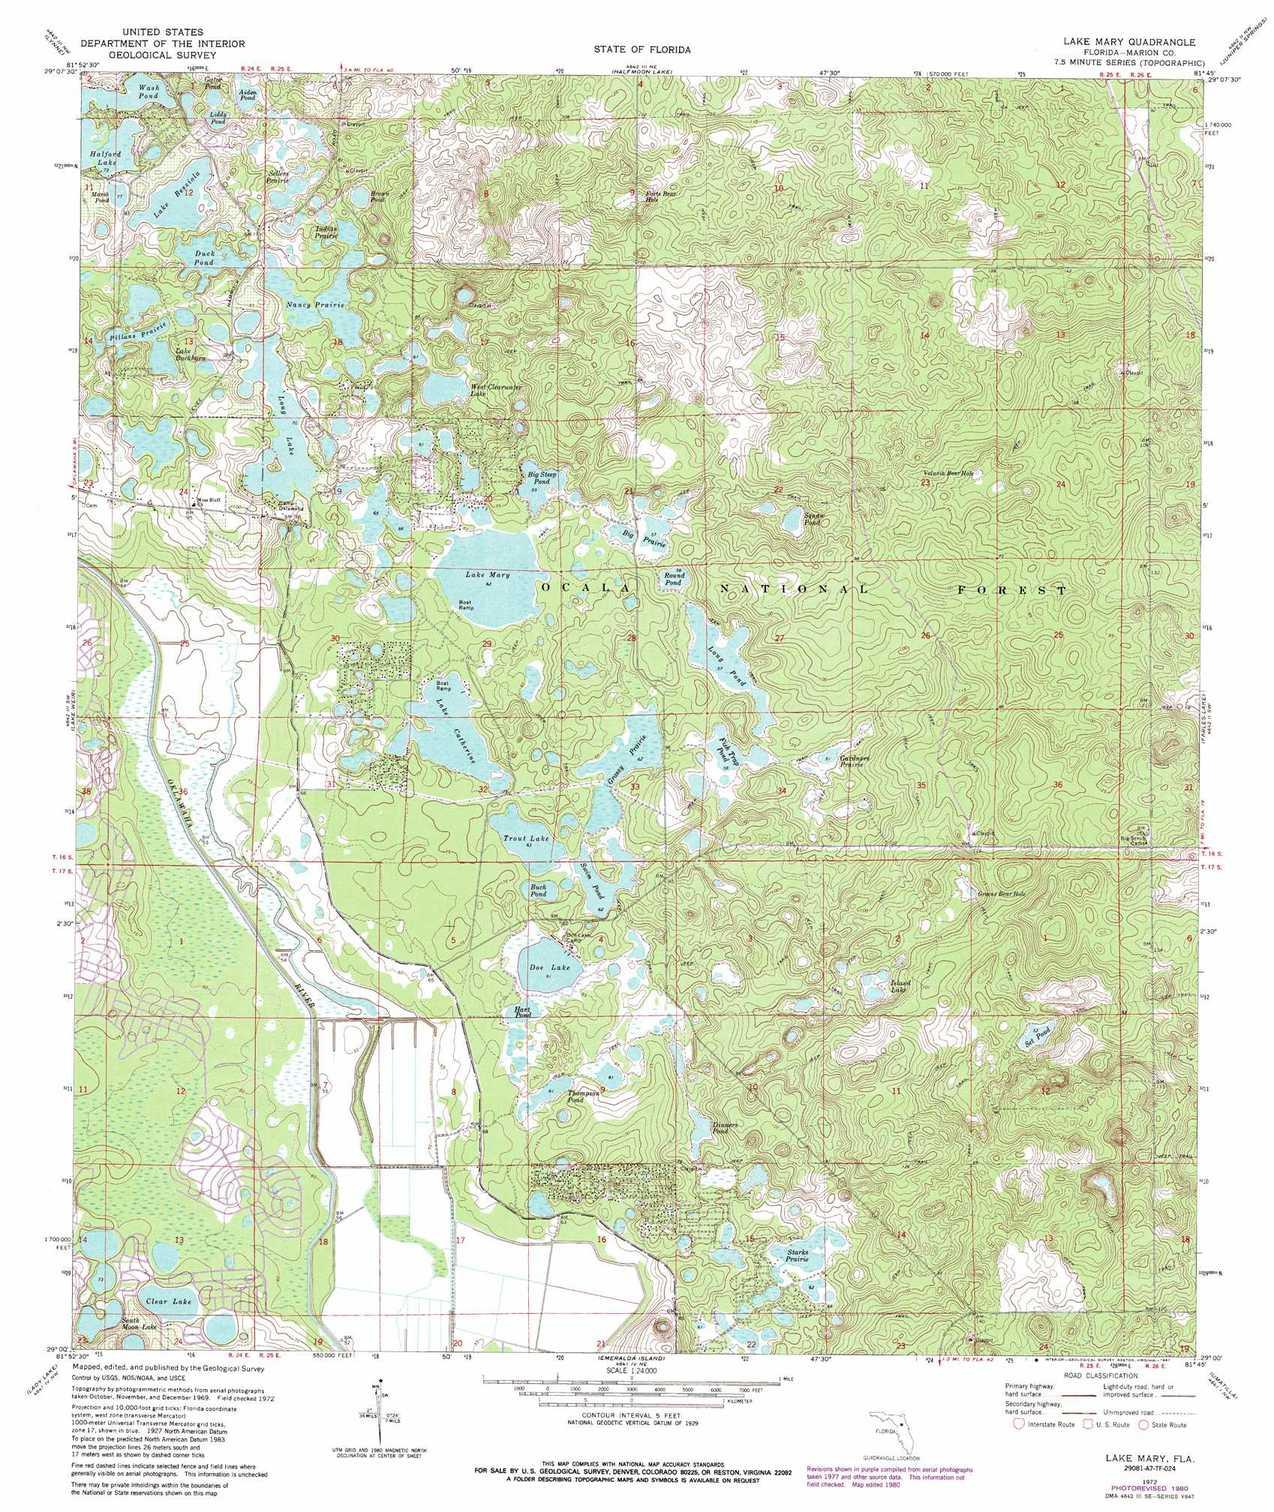 Lake Mary Topographic Map, Fl - Usgs Topo Quad 29081A7 - Lake Mary Florida Map